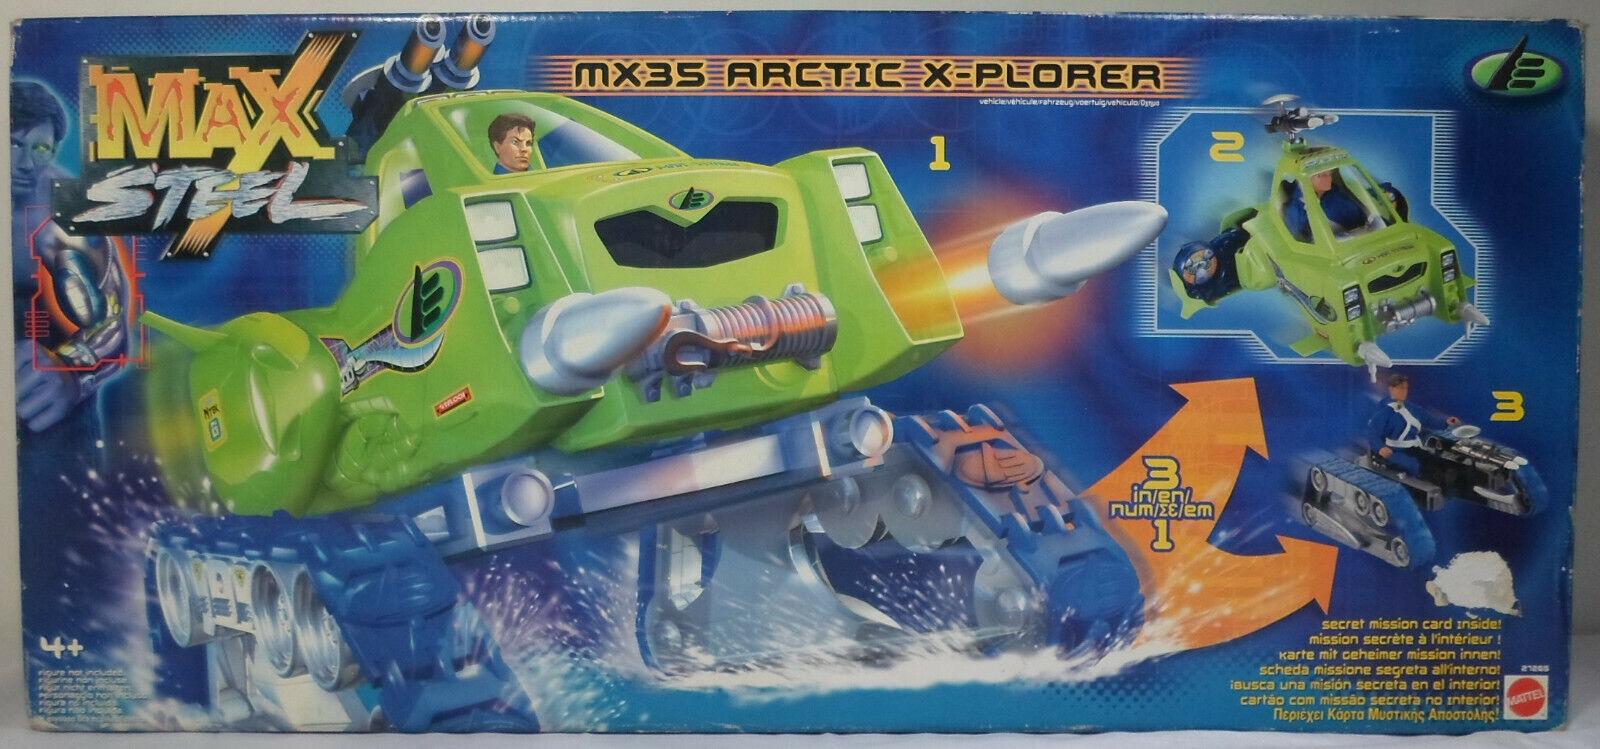 MATTEL  2000 MAX STEEL MX 35 ARCTIC X PLORER VEHICLE MISB EUROPEAN SEALED RARE  shopping en ligne